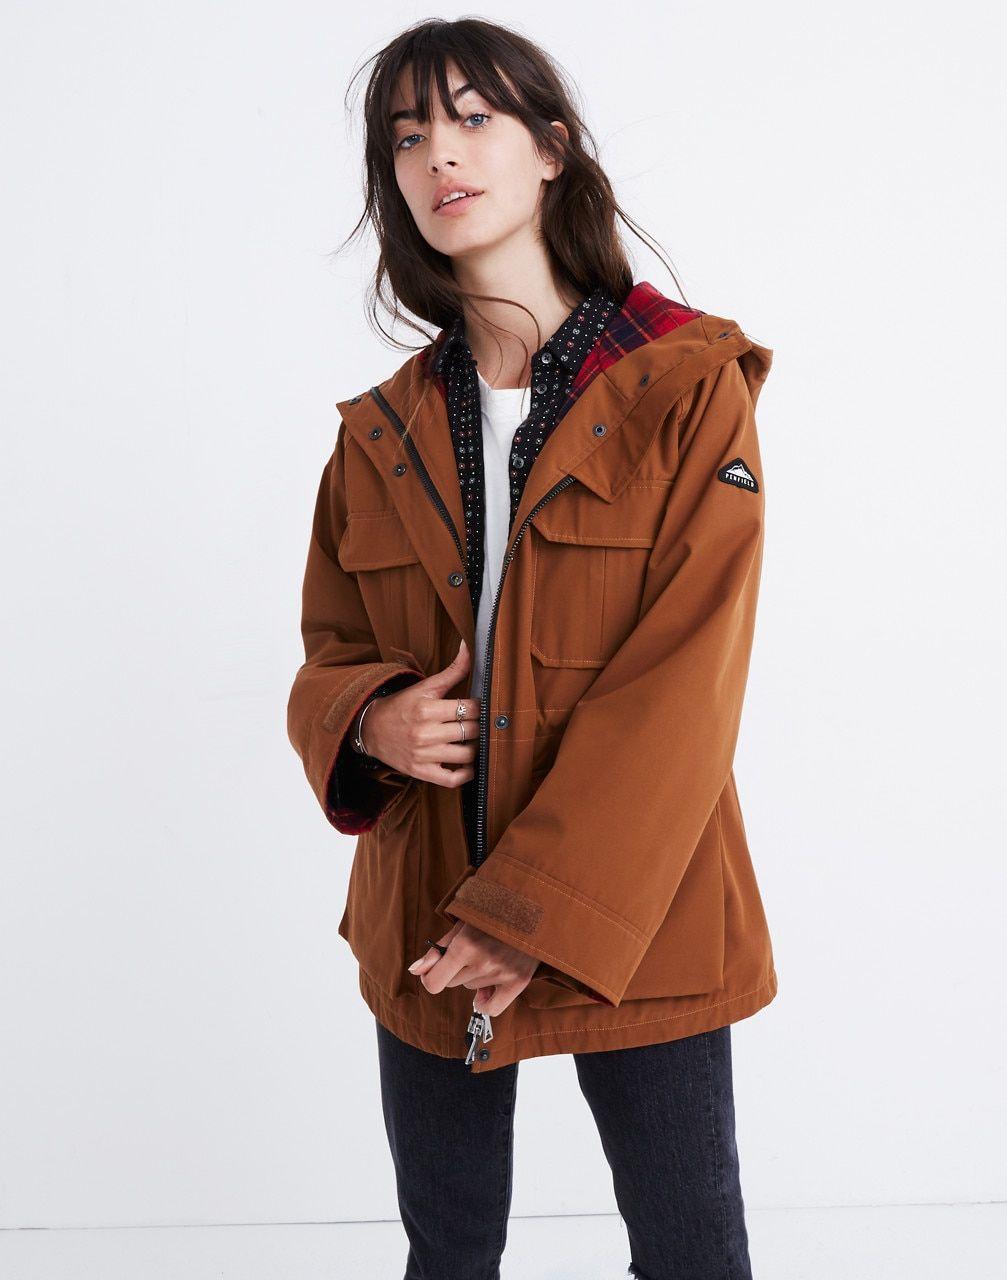 Penfield® 3 Anna's Image Brown Jacket In Madewell X Medbury BUcq757